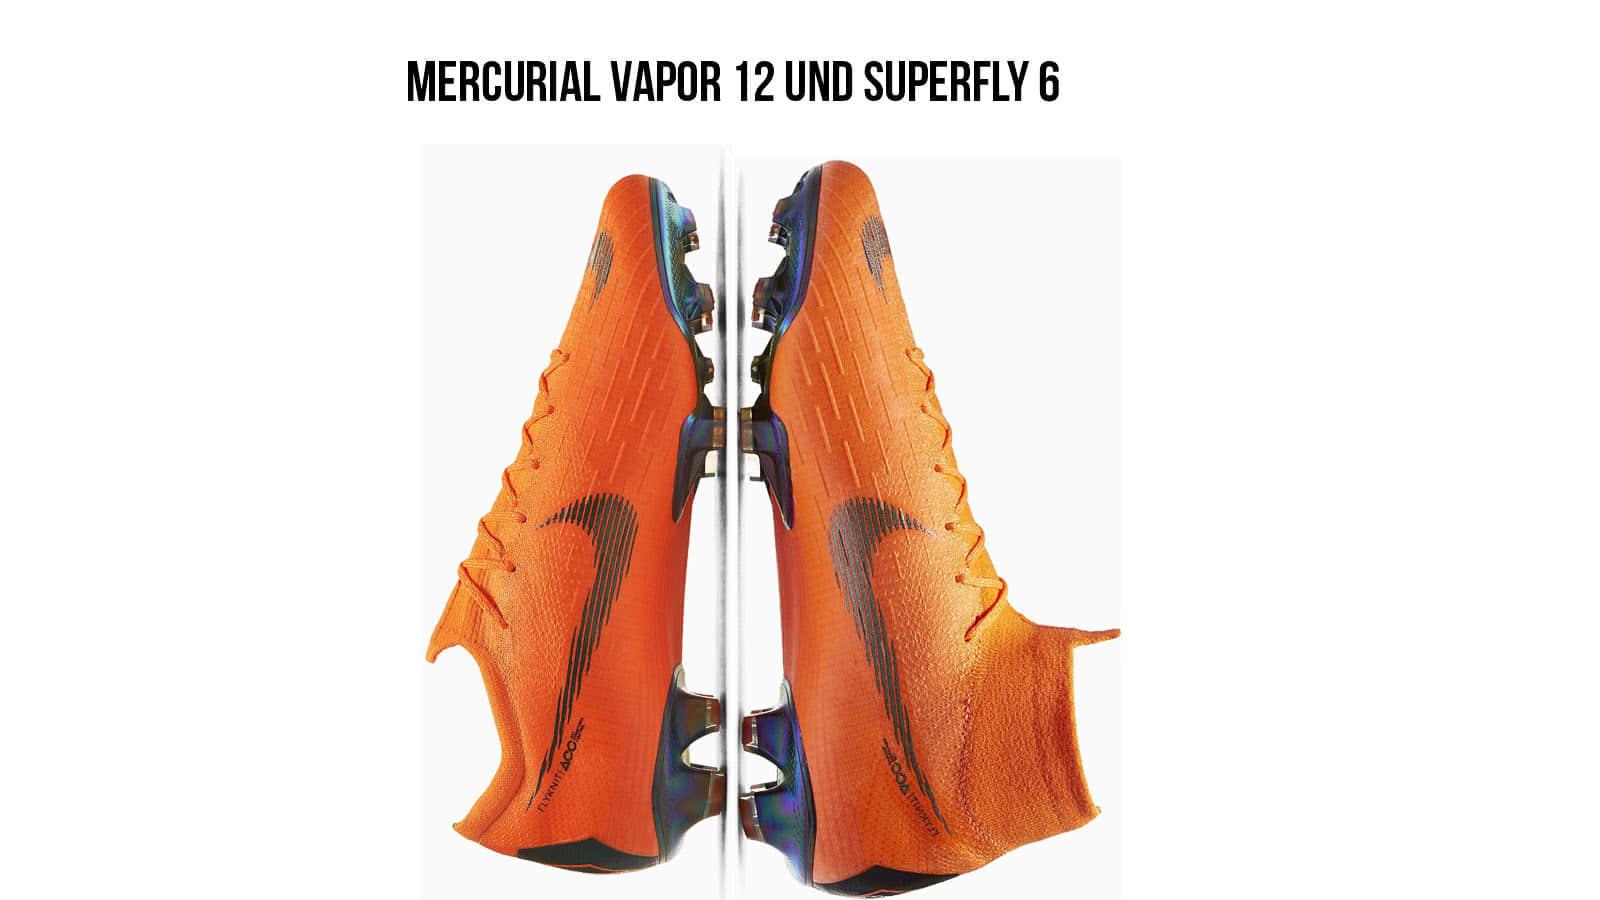 Die Nike-Mercurial-Vapor 360 und-Superfly 360 Fuß